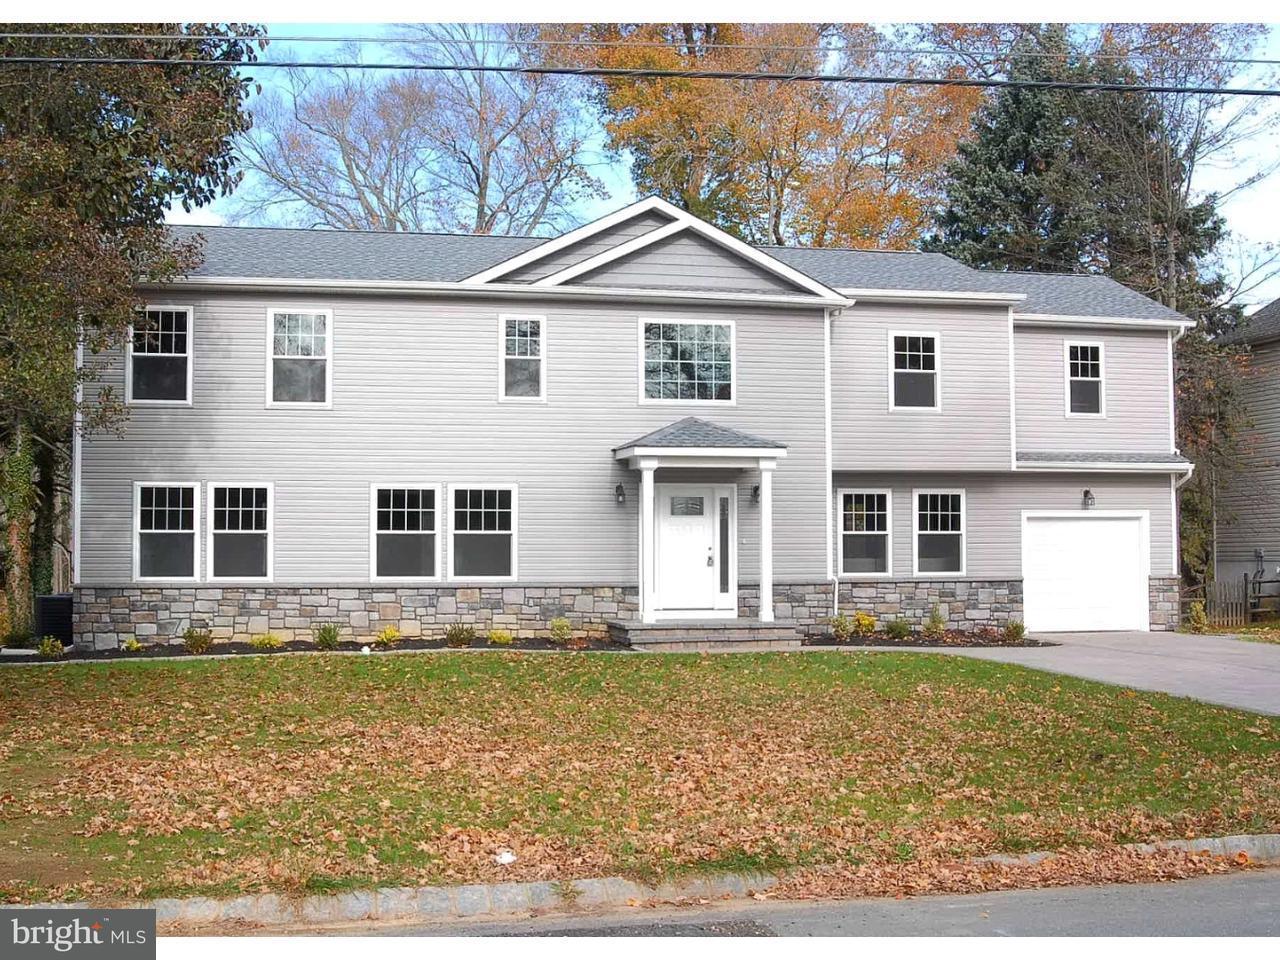 Single Family Home for Sale at 12 JEFFERS Road Plainsboro, New Jersey 08536 United StatesMunicipality: Plainsboro Township